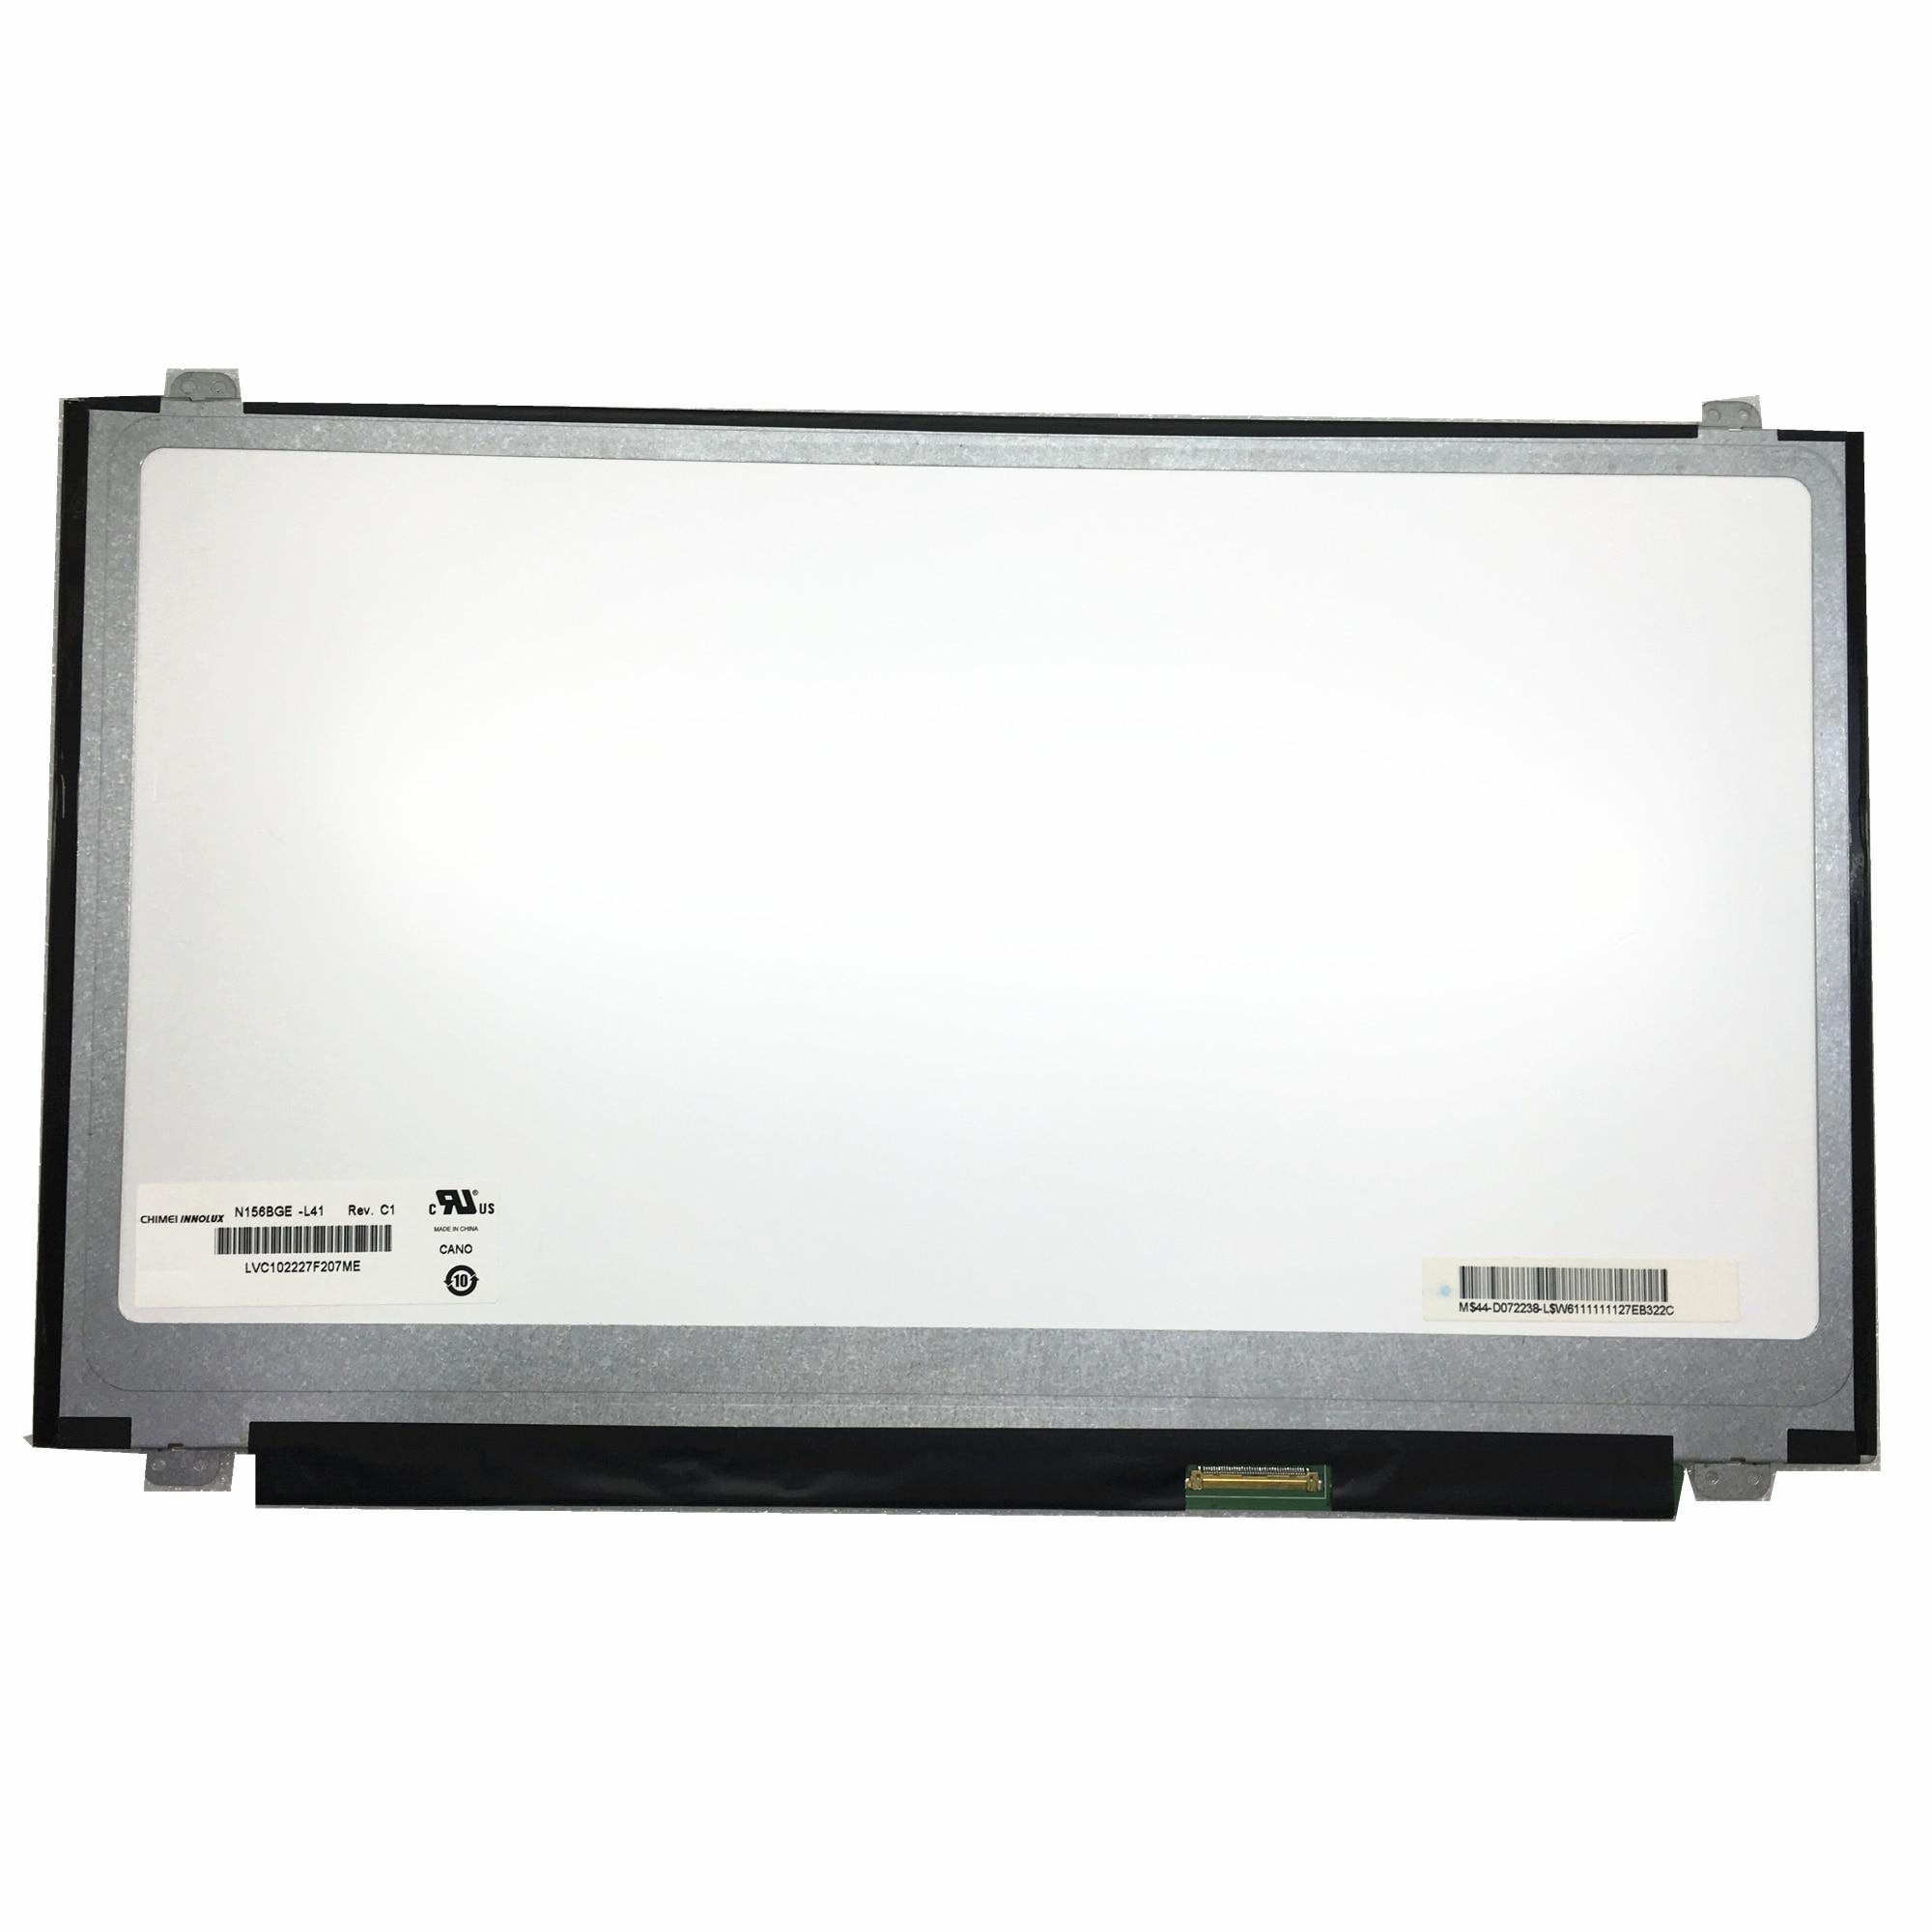 Frete grátis N156BGE-L41 N156BGE-L31 ltn156at30 p01 ltn156at20 h01 w01 LP156WH3-TLSA portátil tela lcd 1366*768 lvds 40pin